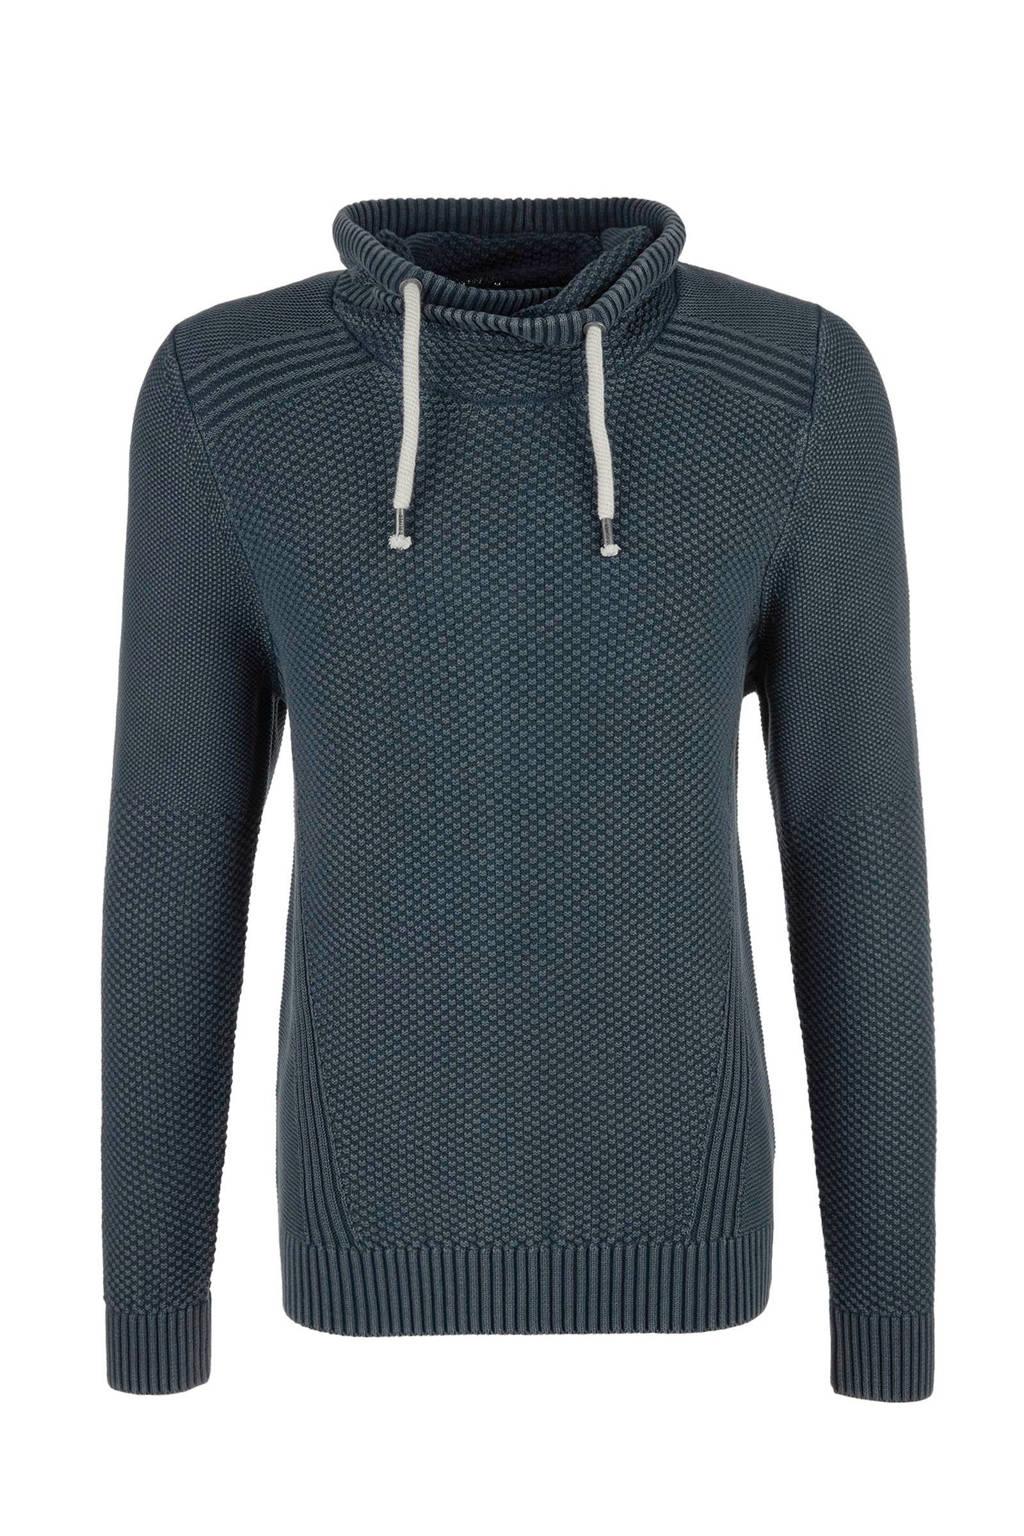 s.Oliver trui met print donkerblauw, Donkerblauw